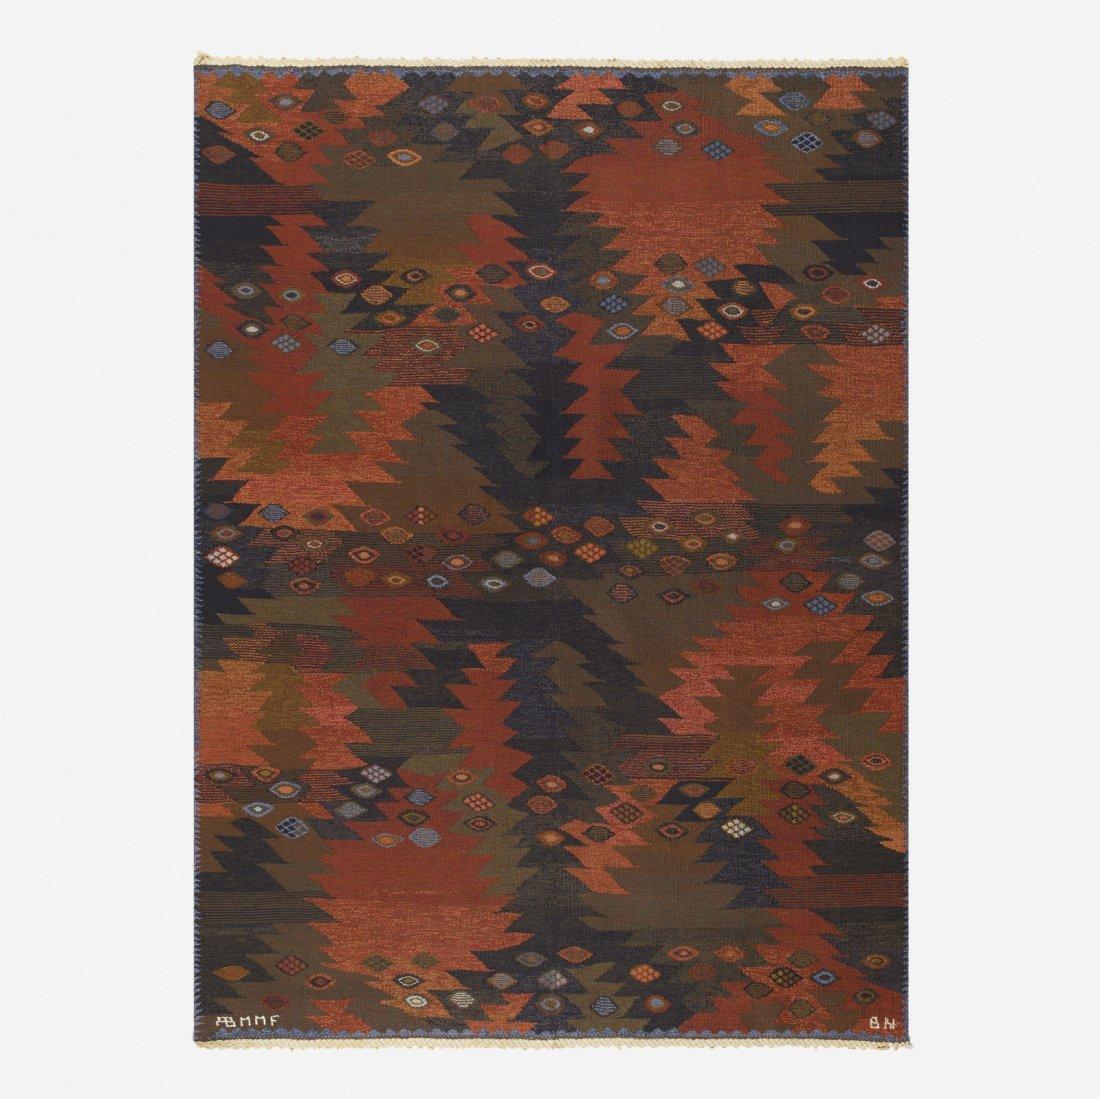 Barbro Nilsson, Tanga tapestry weave carpet